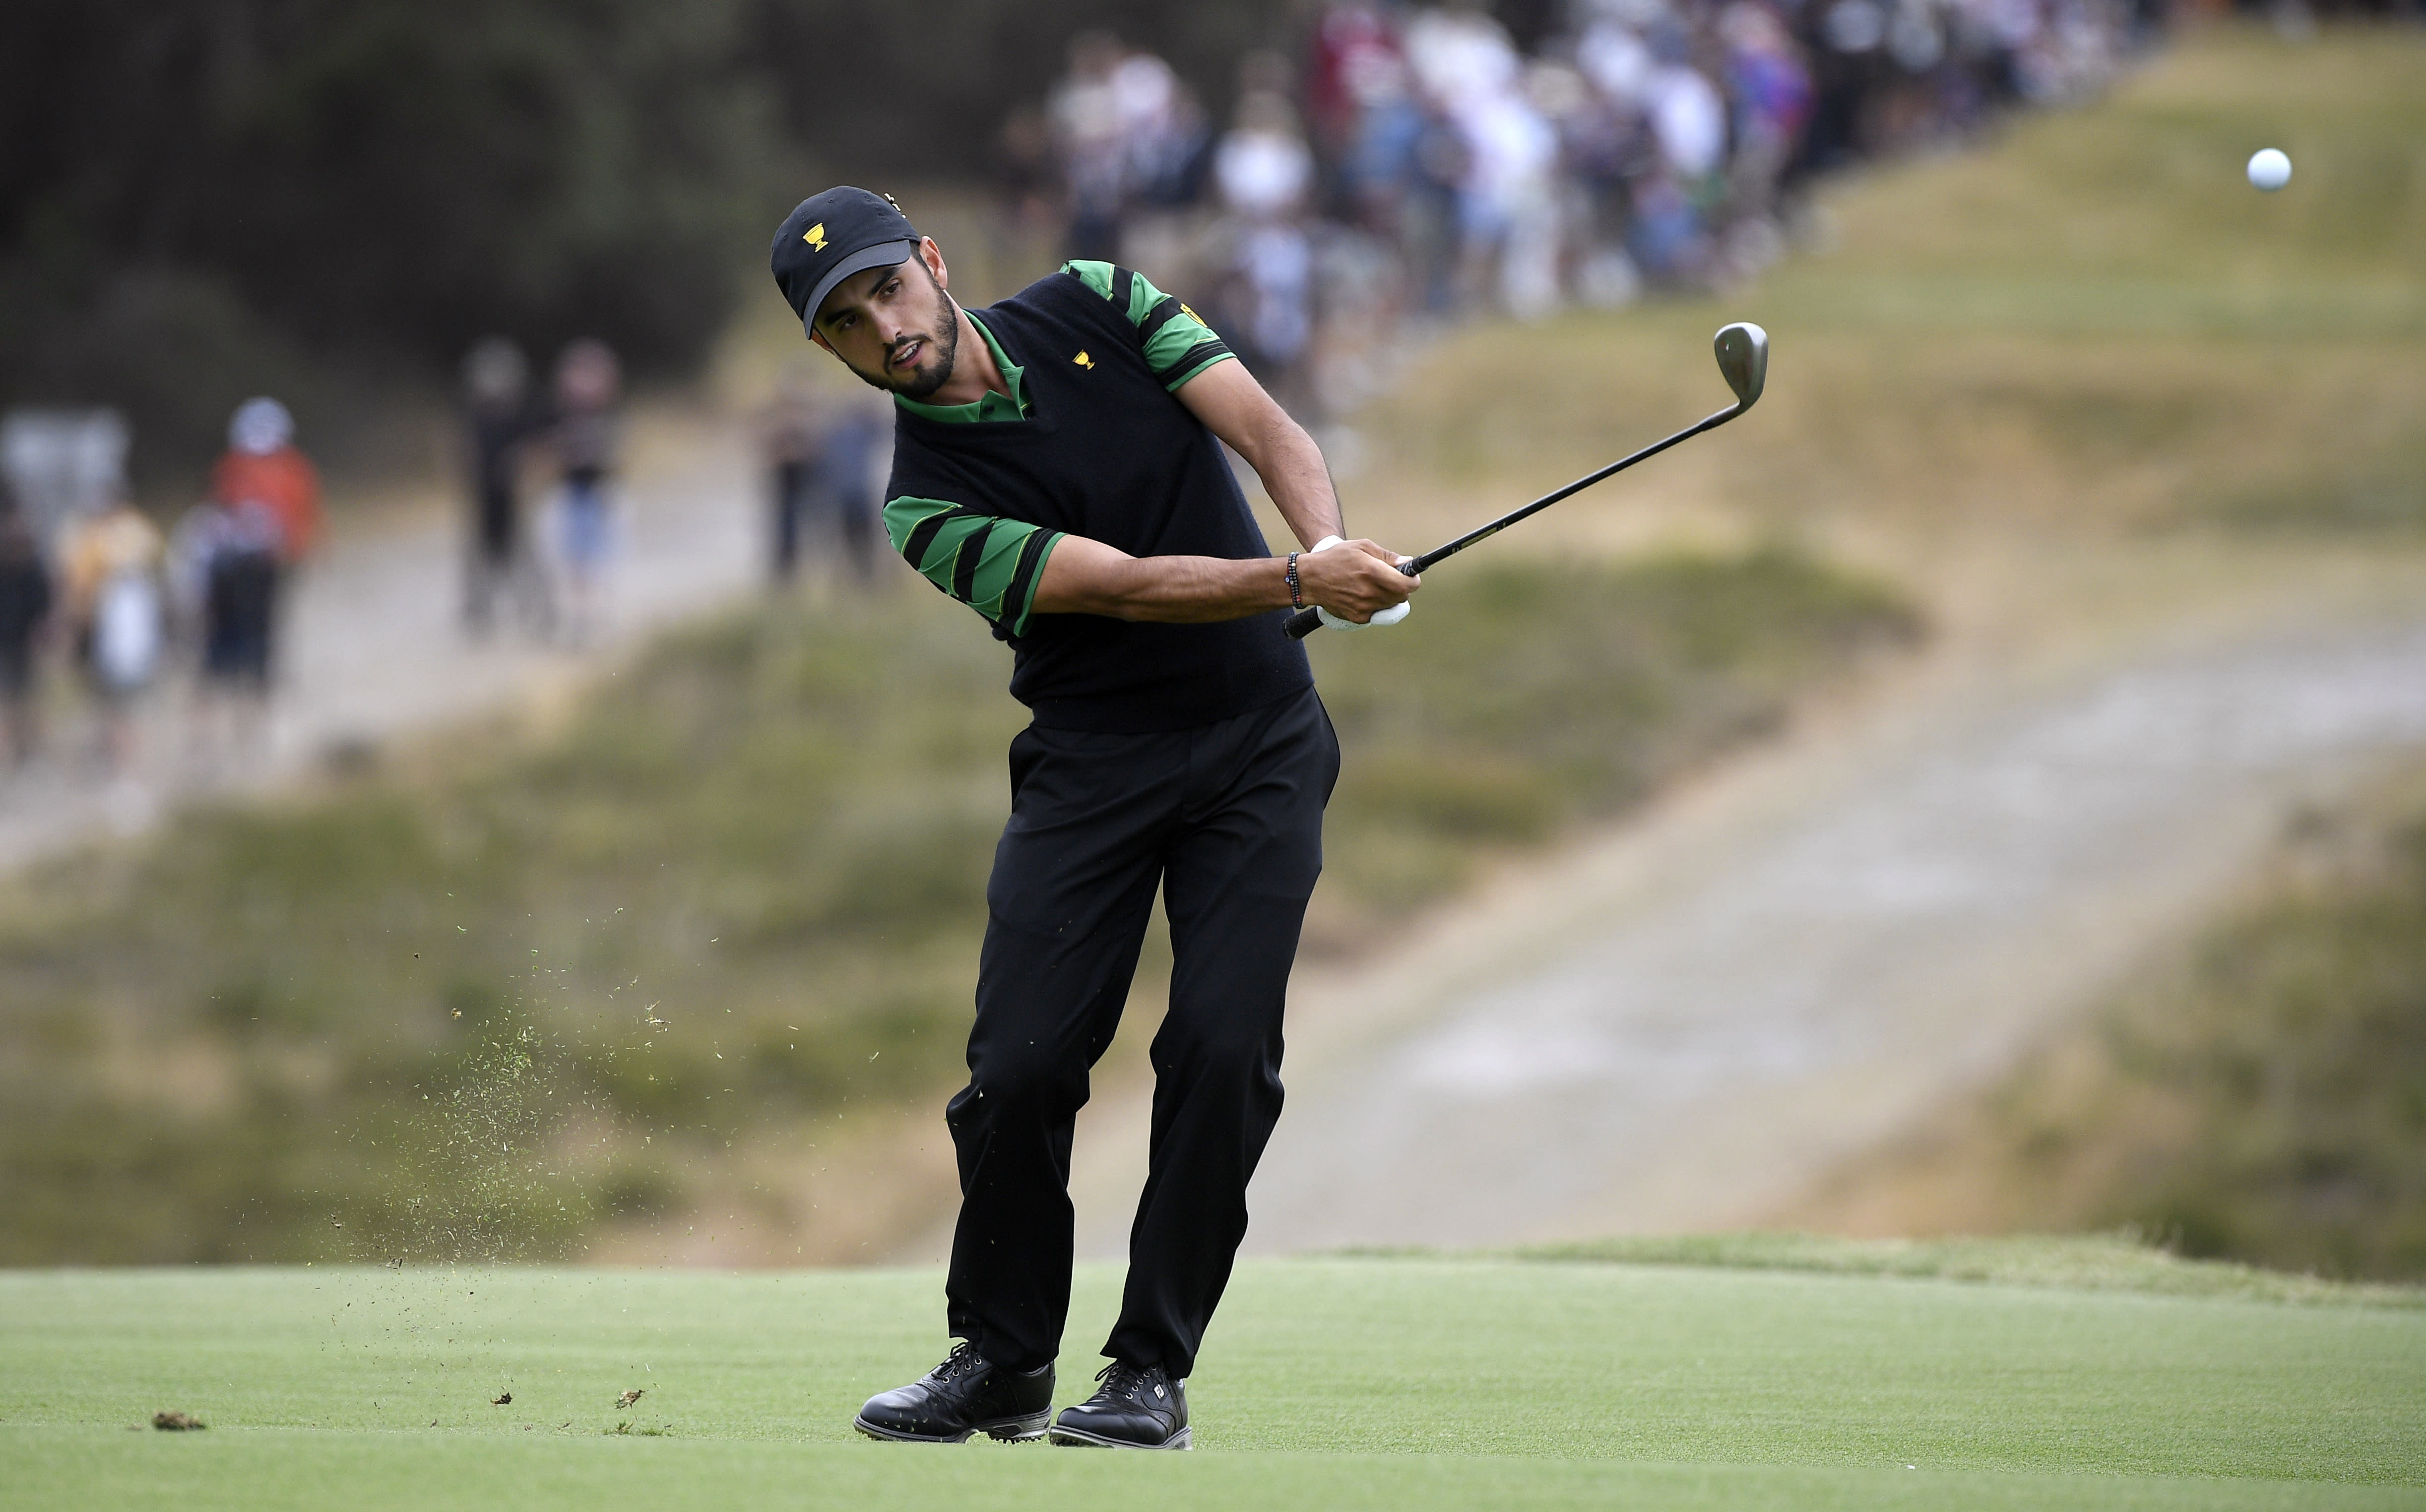 Golf this week: The Australian PGA Championship